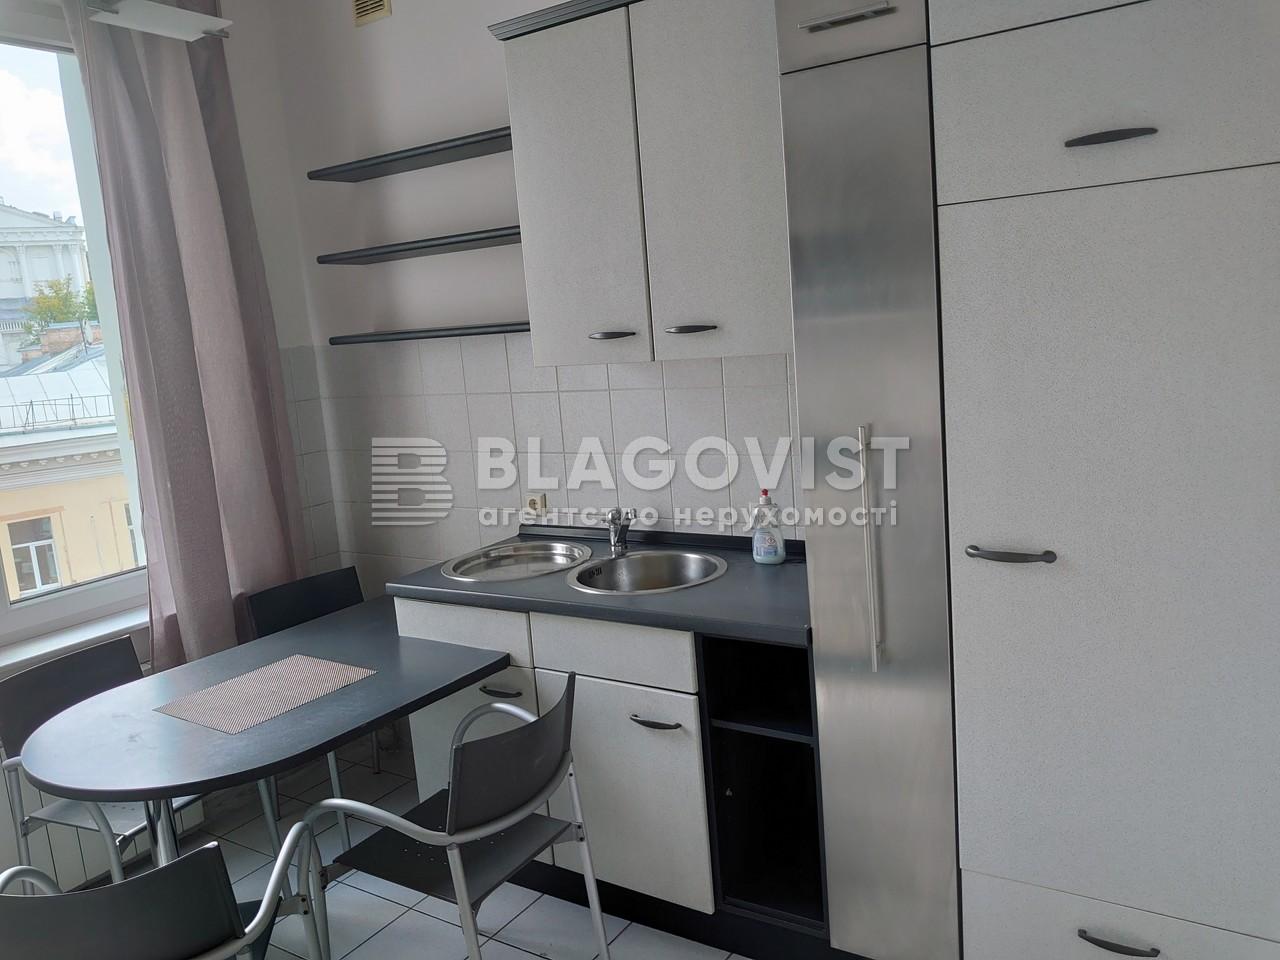 Квартира R-39925, Крещатик, 21, Киев - Фото 16